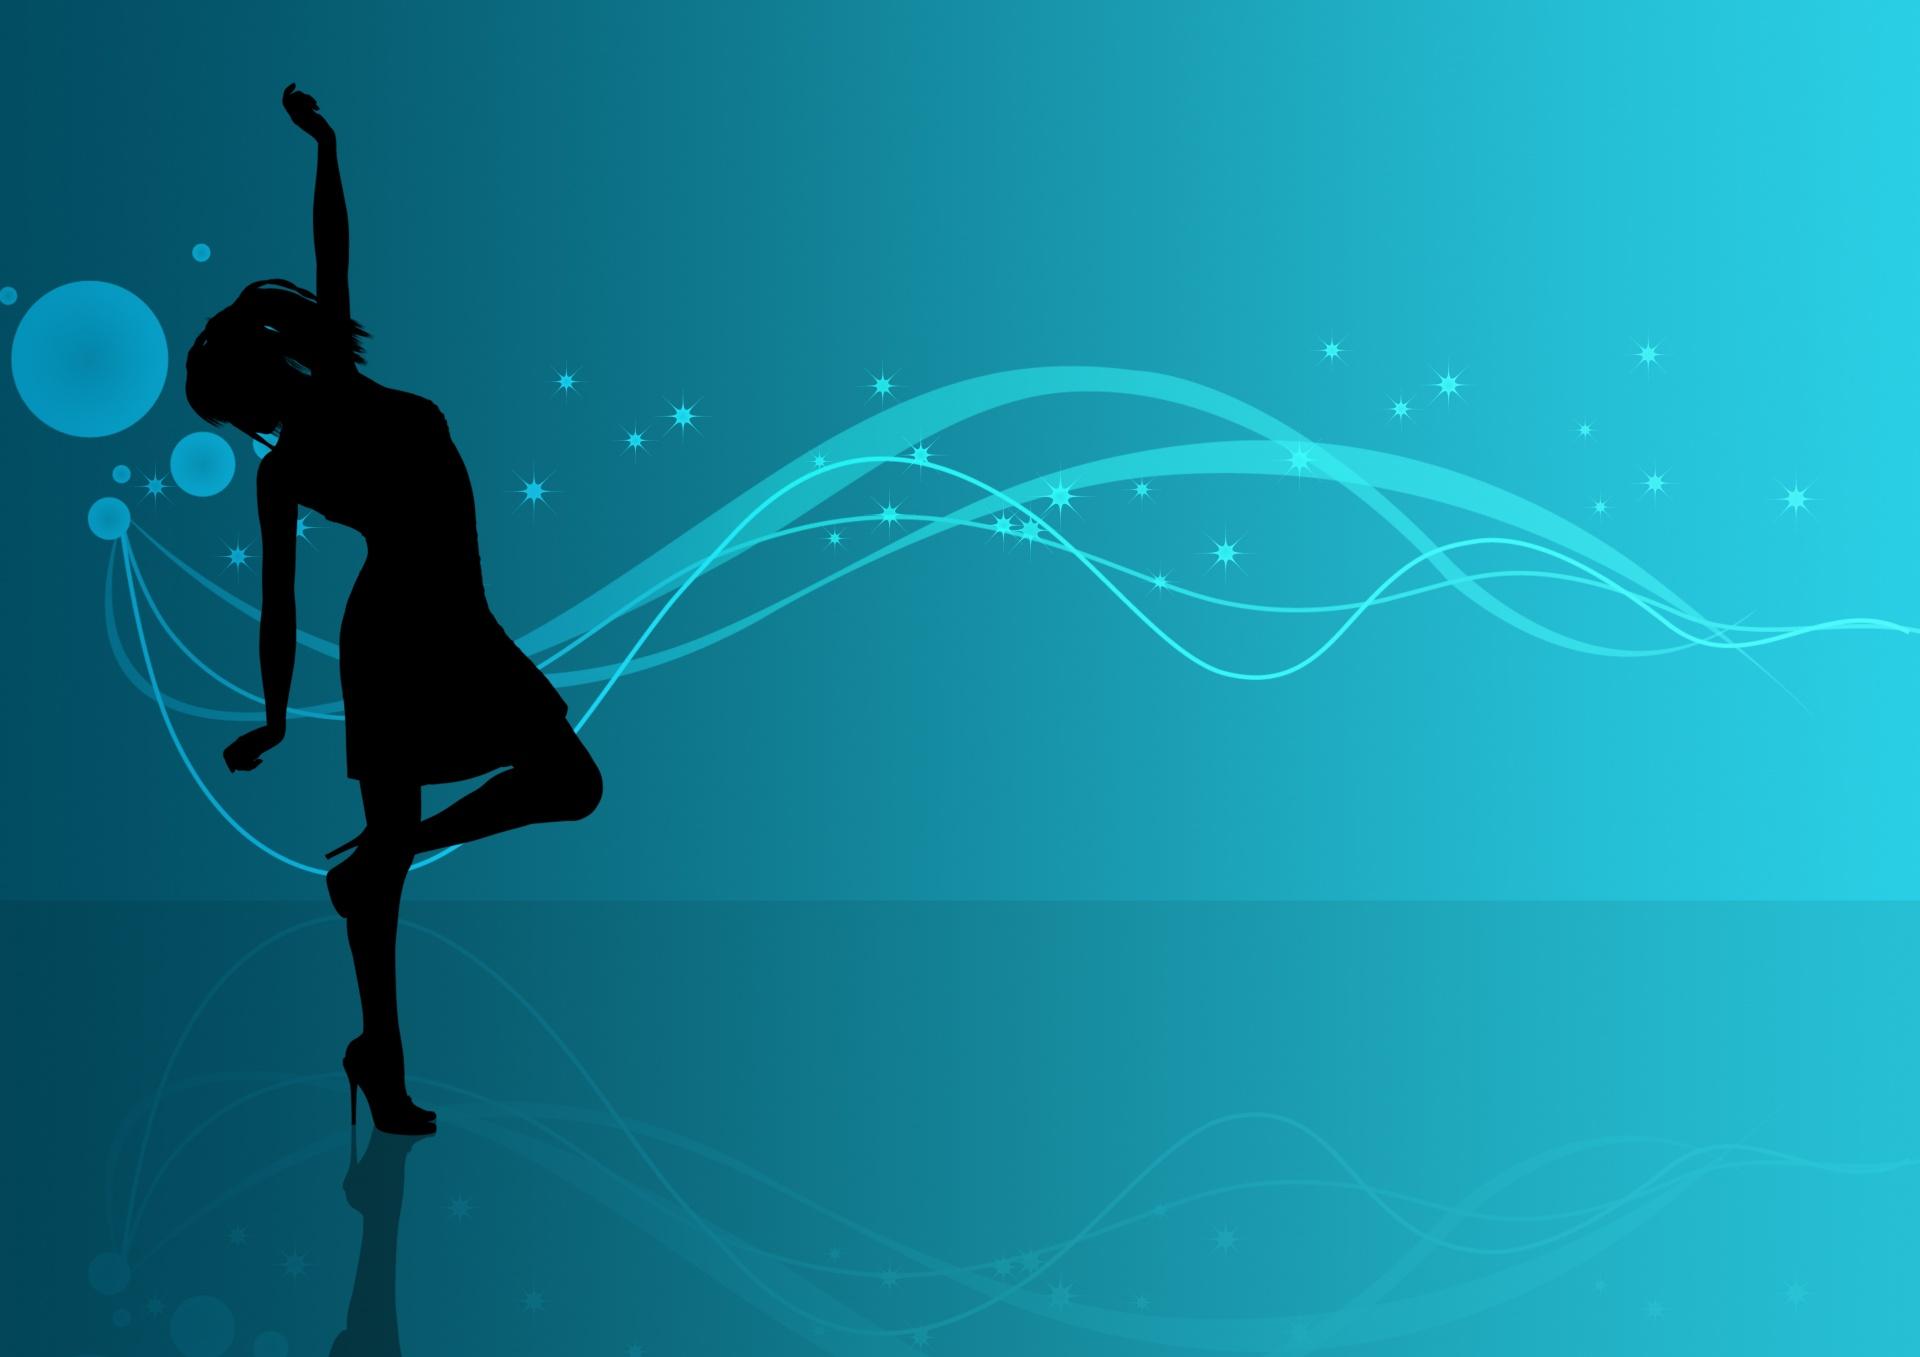 trendy-female-silhouette-background